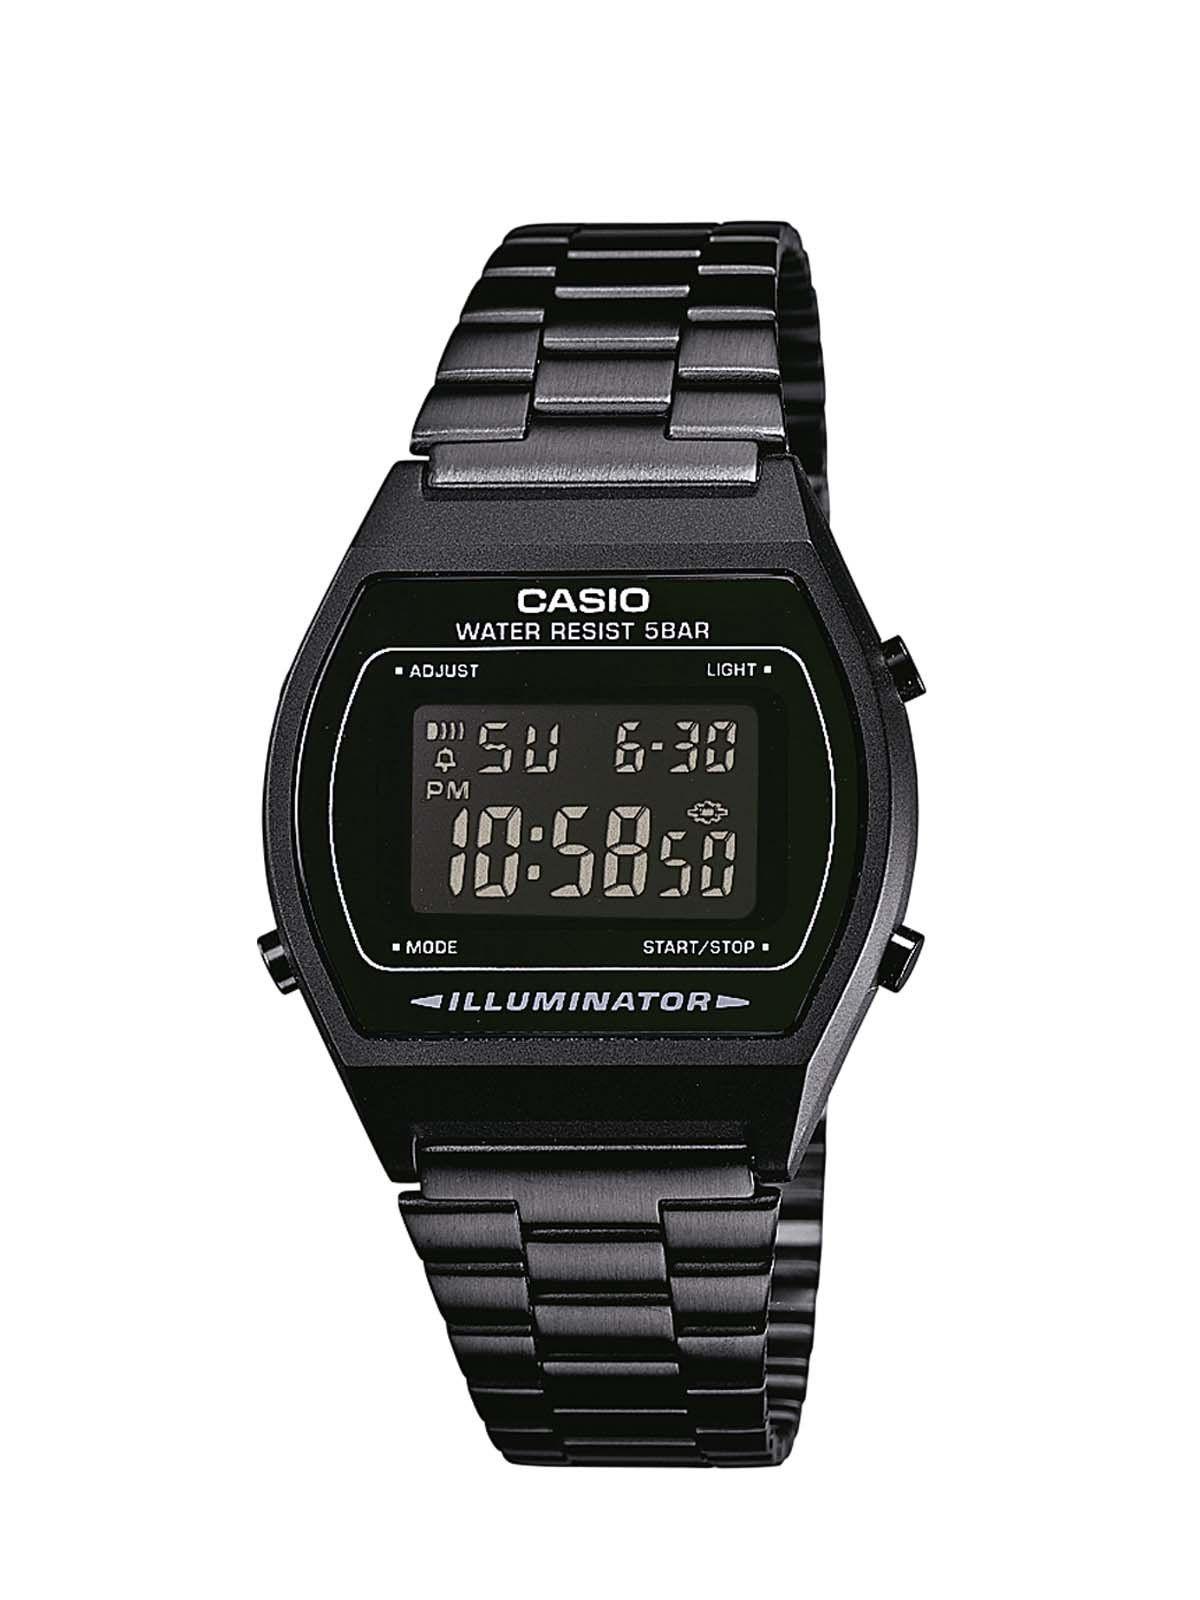 79670cb3d0e9 Casio B640WB-1BEF - Reloj analógico de cuarzo unisex con correa de acero  inoxidable